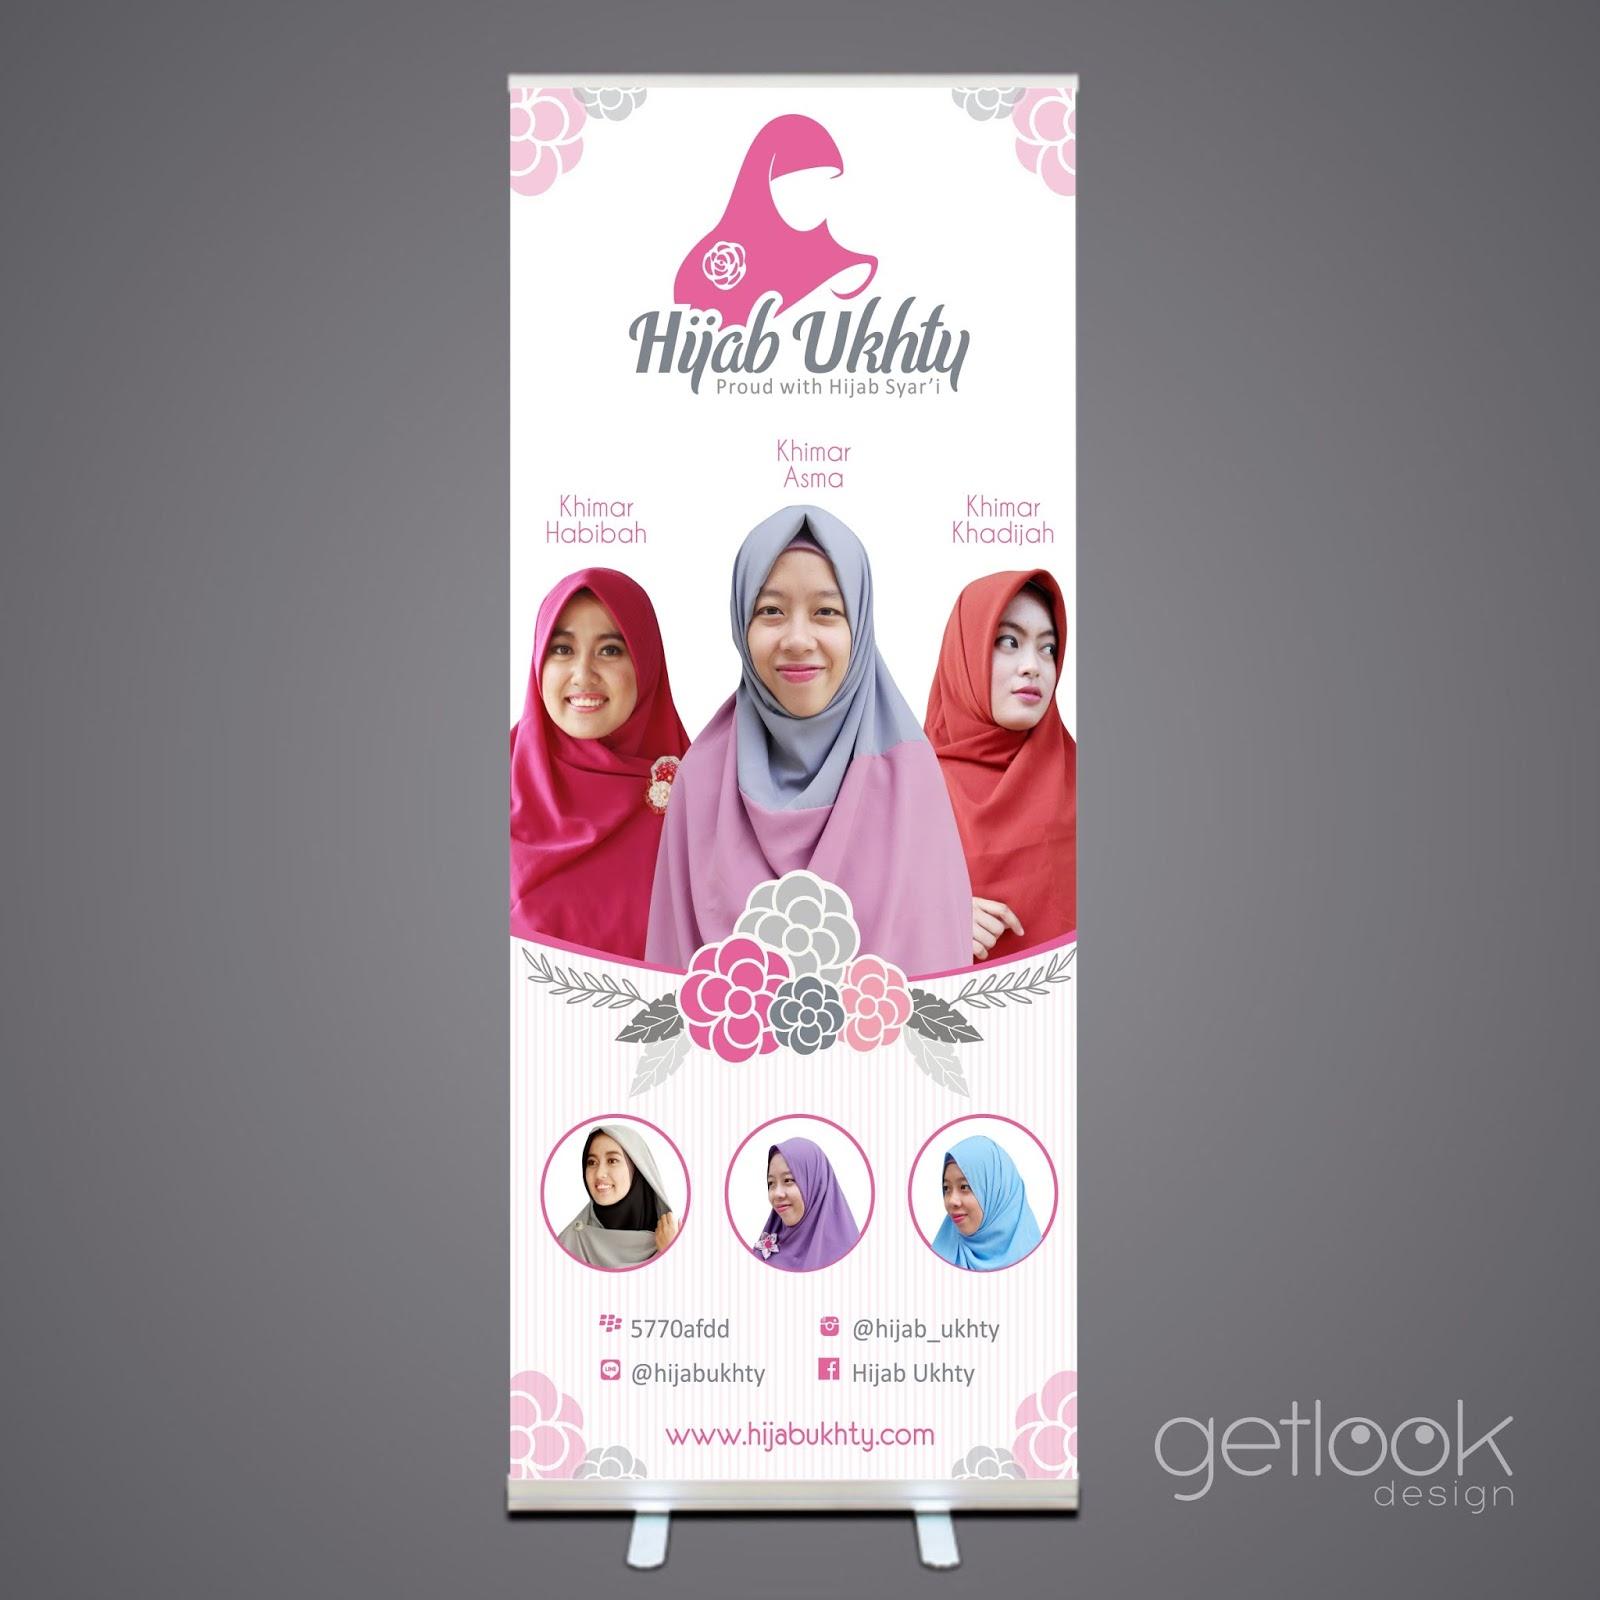 Desain x-banner hijab ukhty  getlookdesign